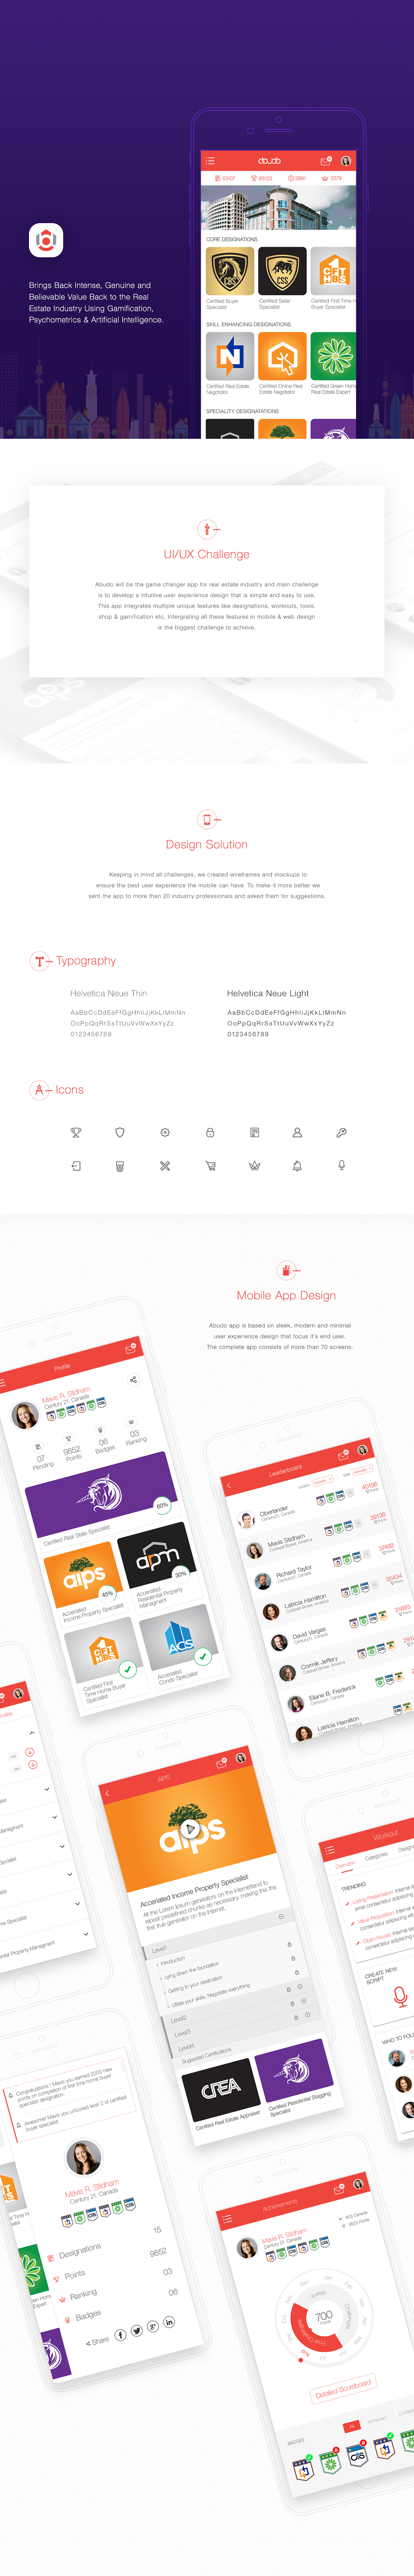 real estate mobile app design educational app helvetica minimal Whitespace